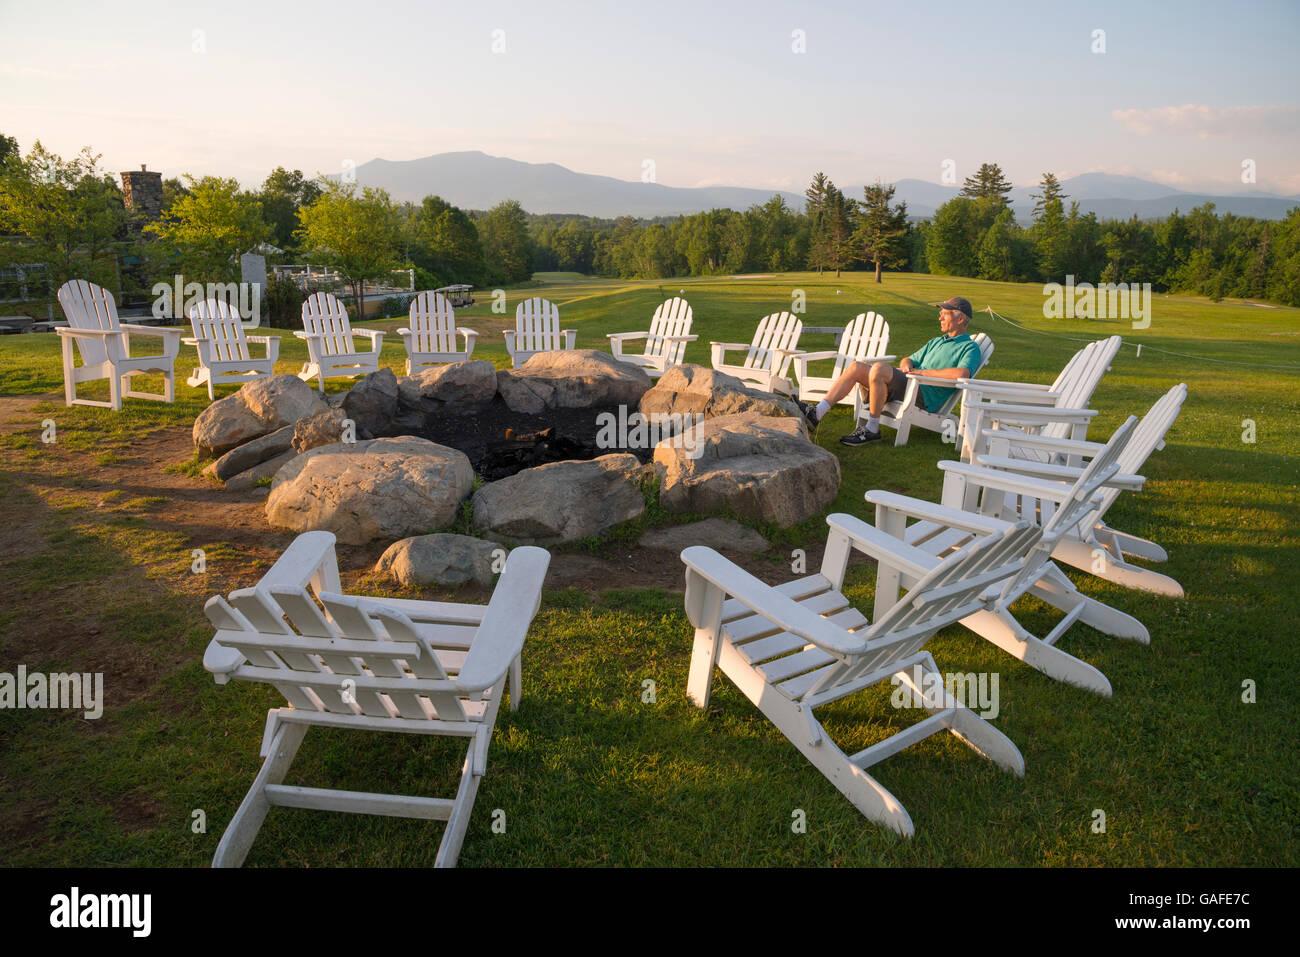 Great Adirondack Chairs Around Fire Pit, Summer, Mountain View Grand Resort, New  Hampshire.